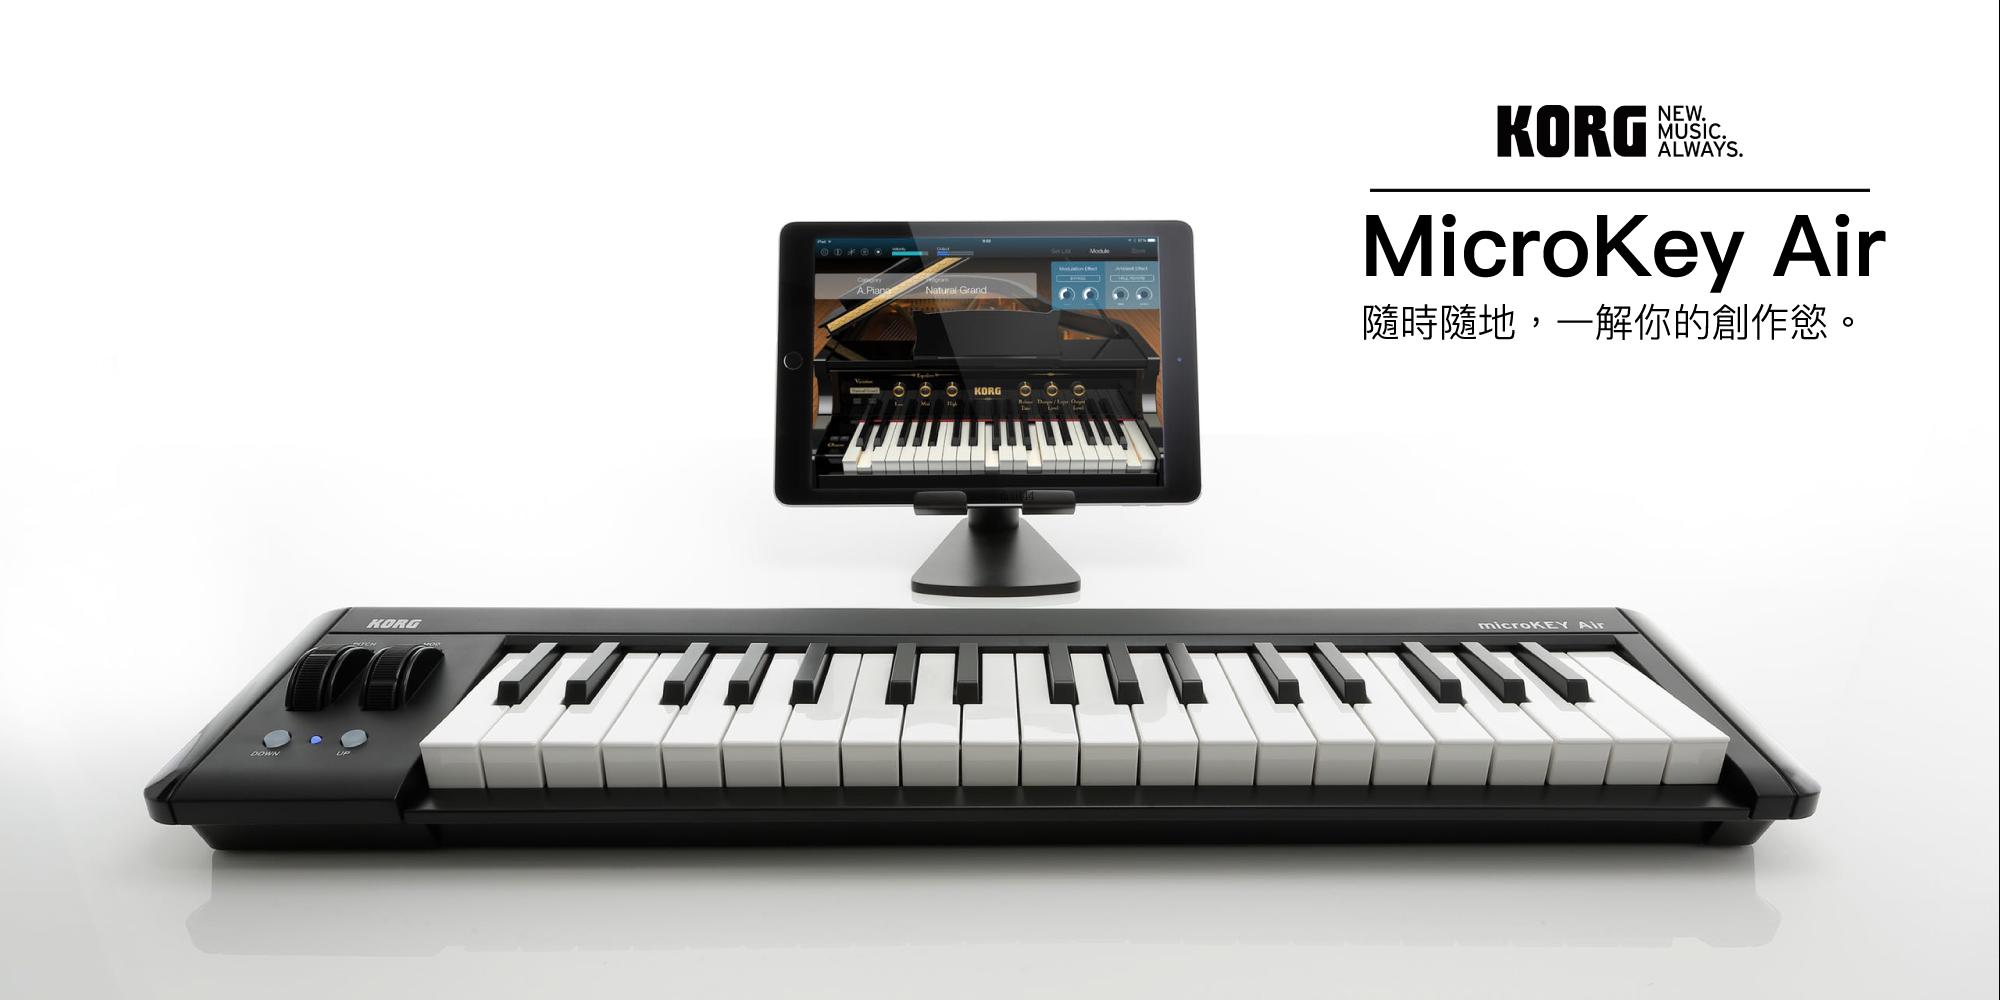 Korg MicroKey Air 藍牙主控鍵盤